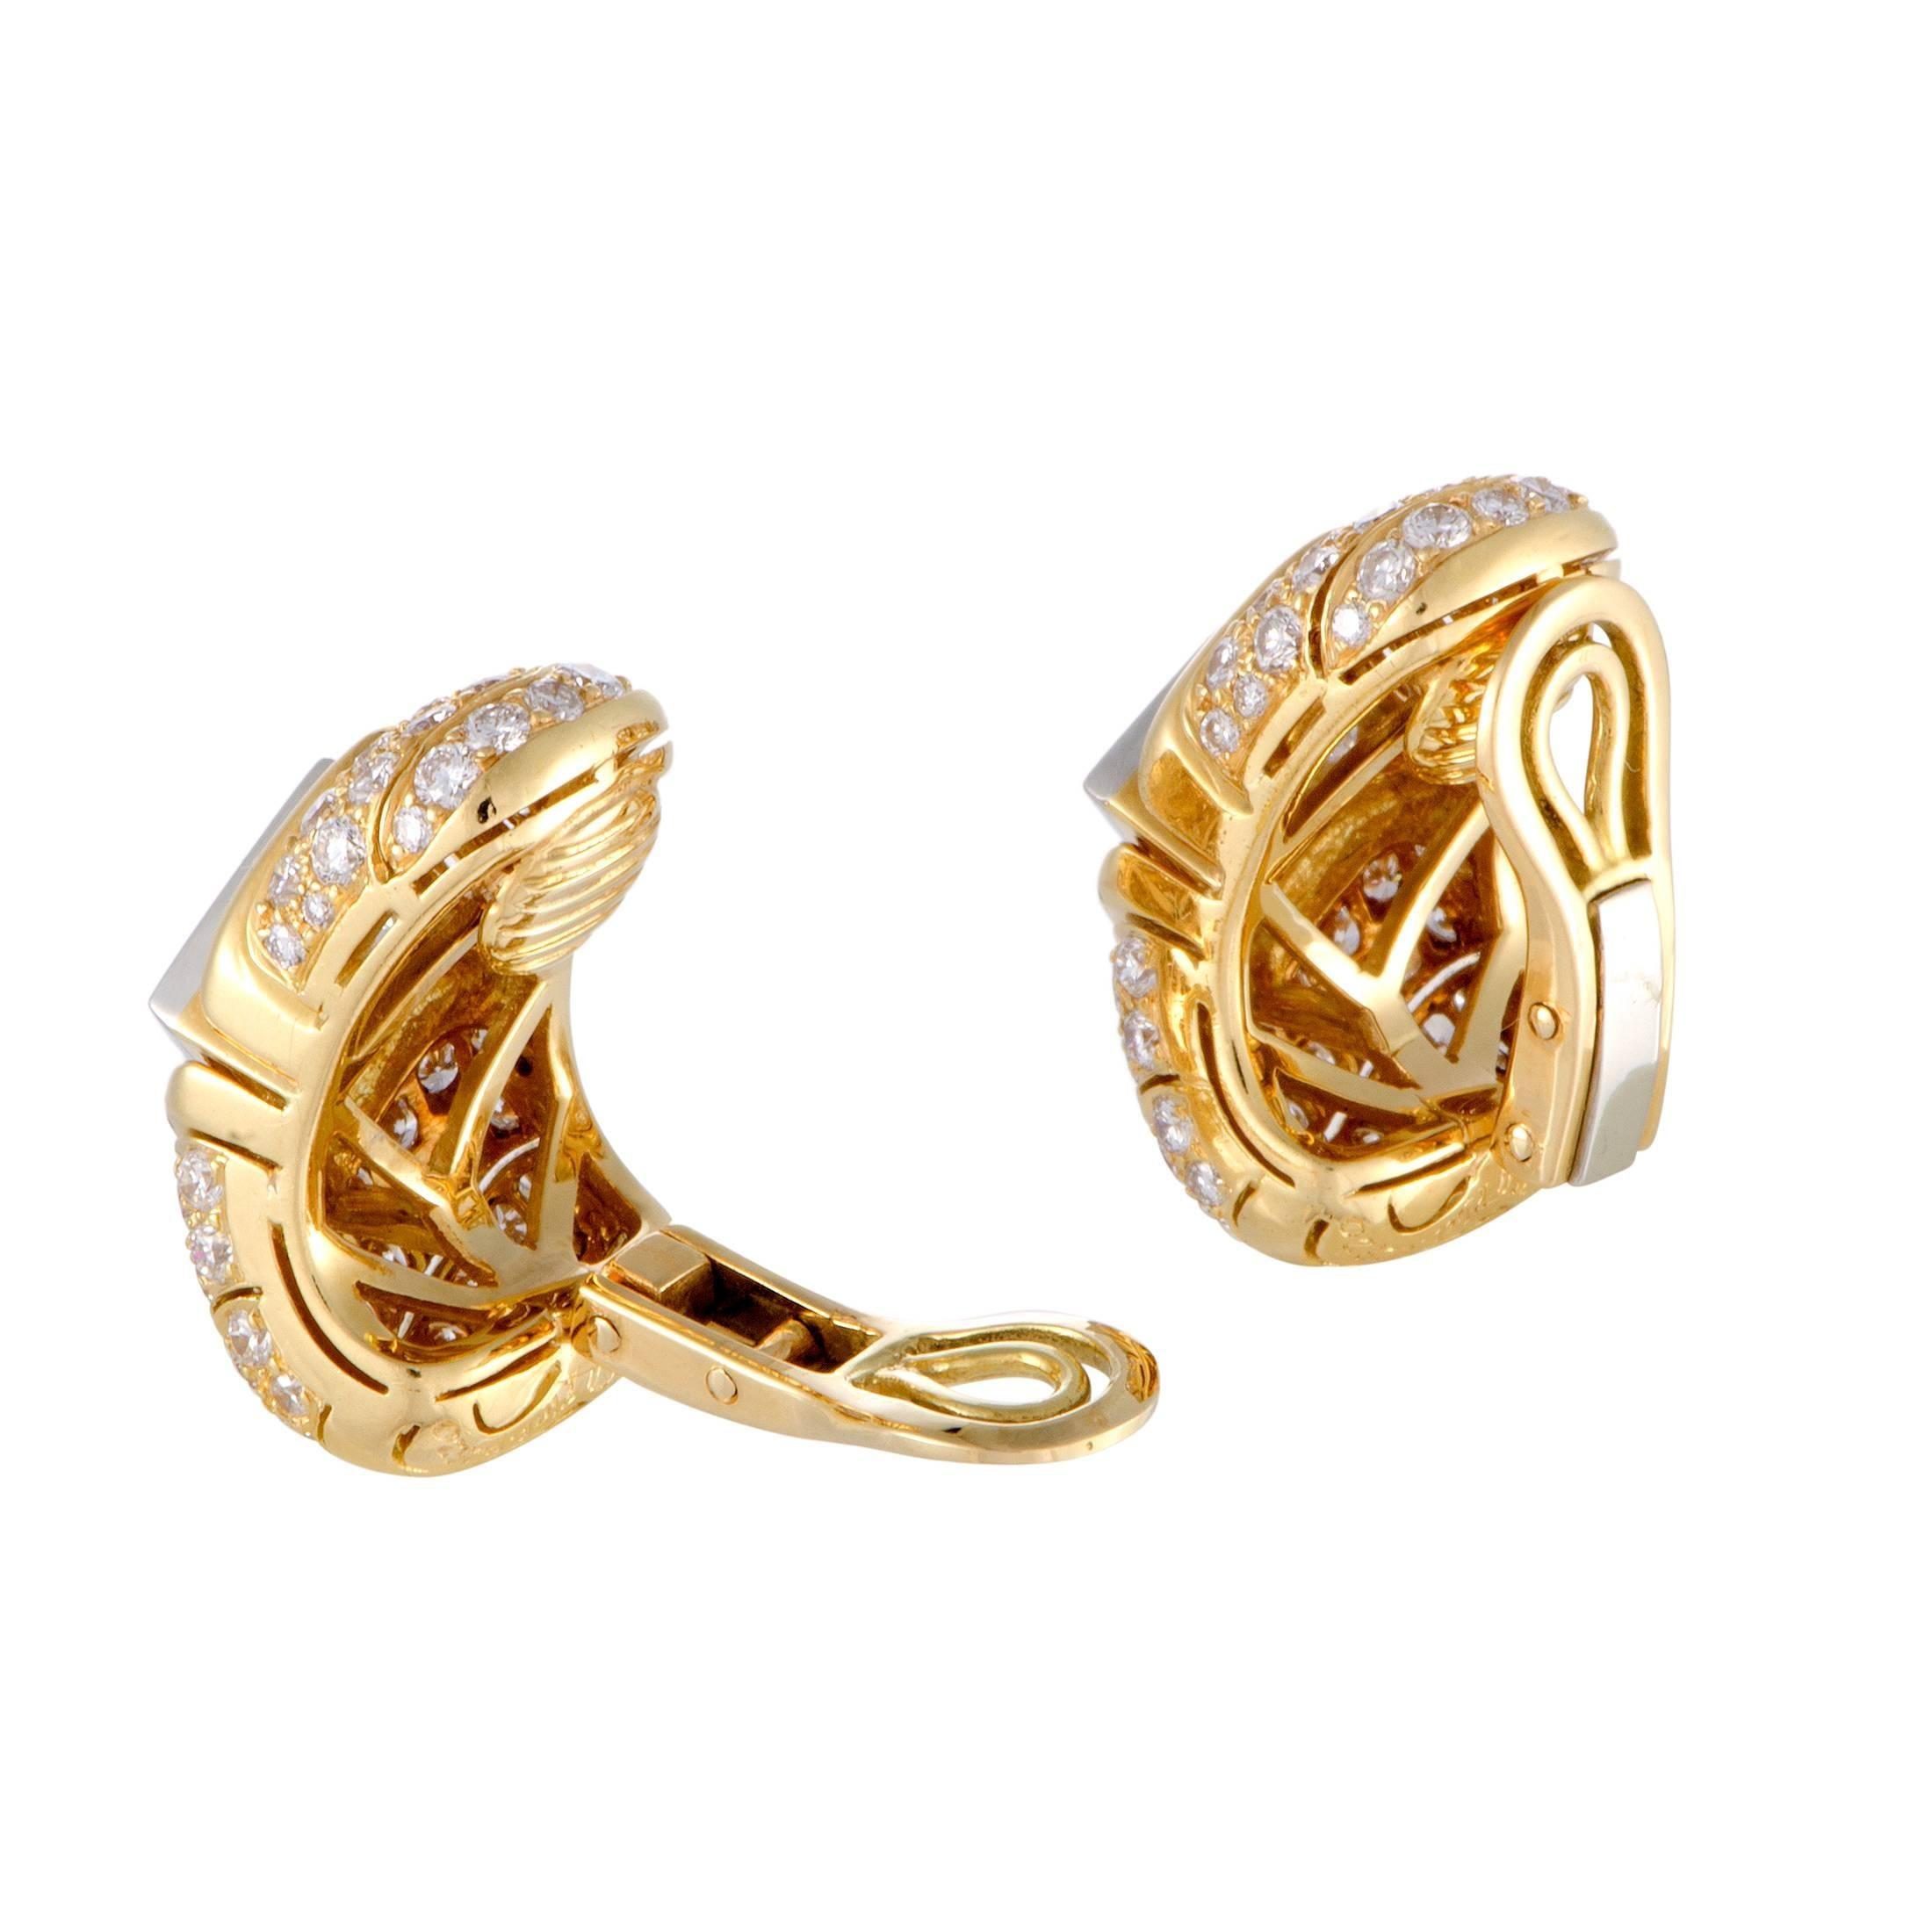 bulgari full diamond pave yellow gold and platinum clipon earrings 3